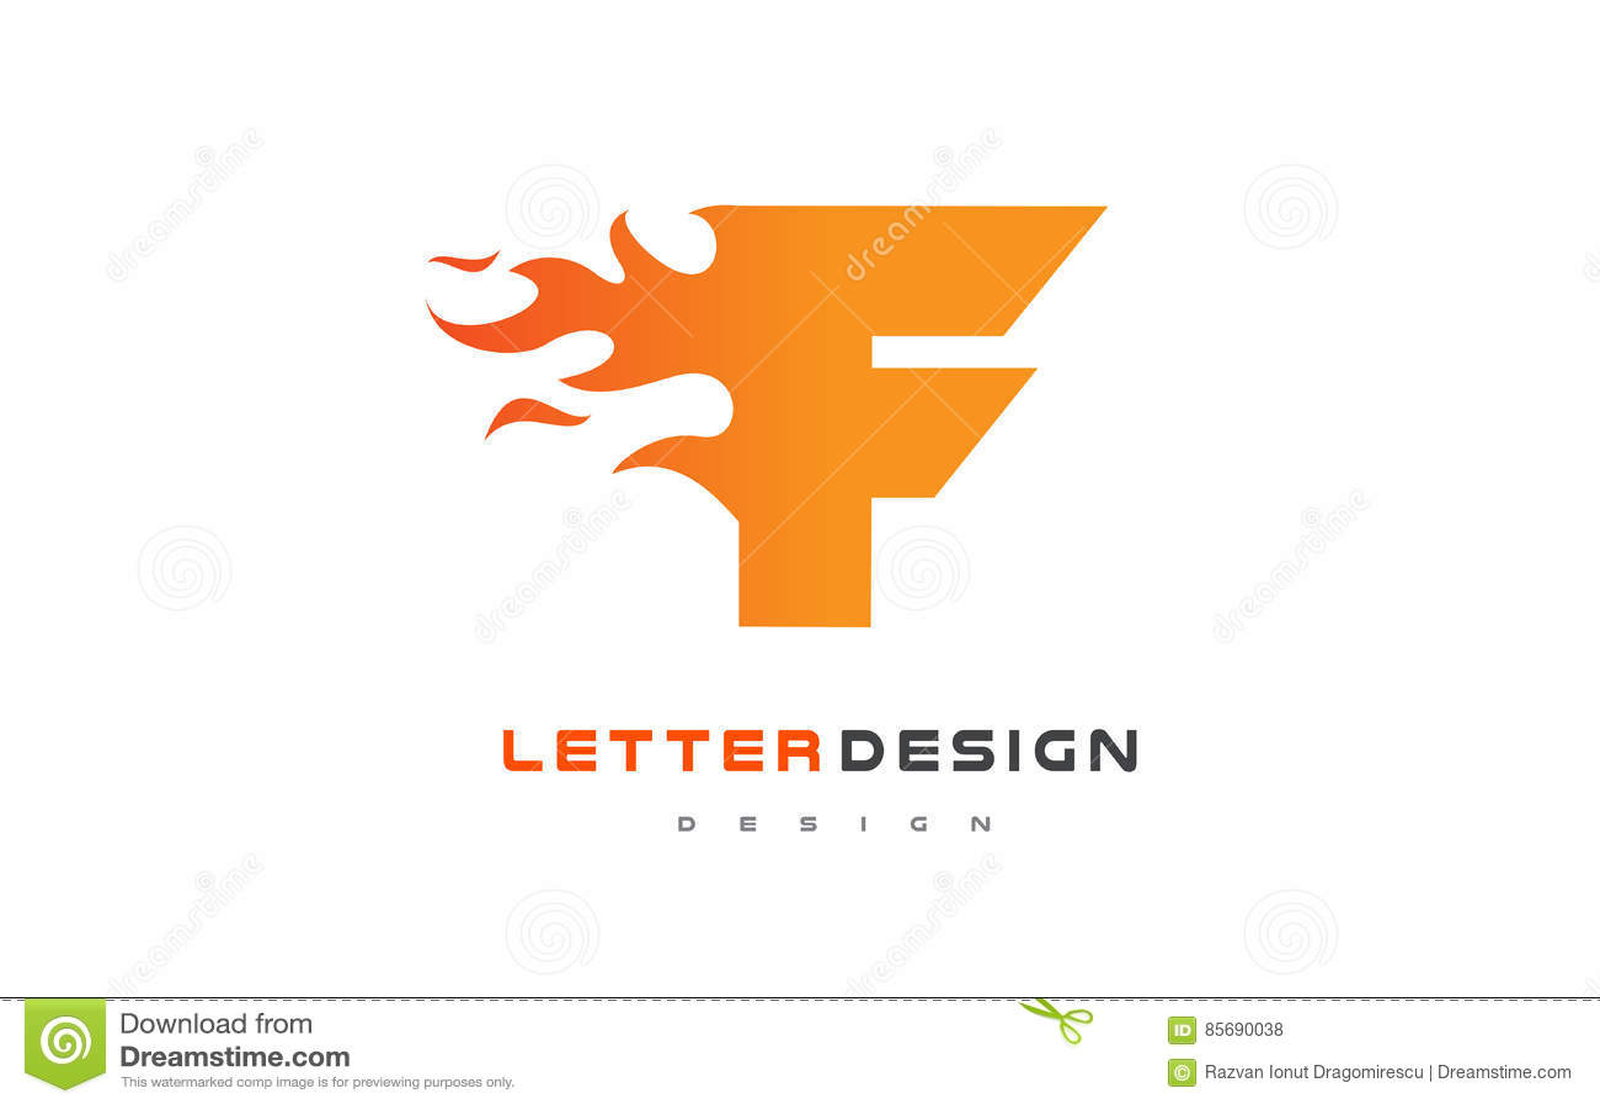 Font that looks like fire 11